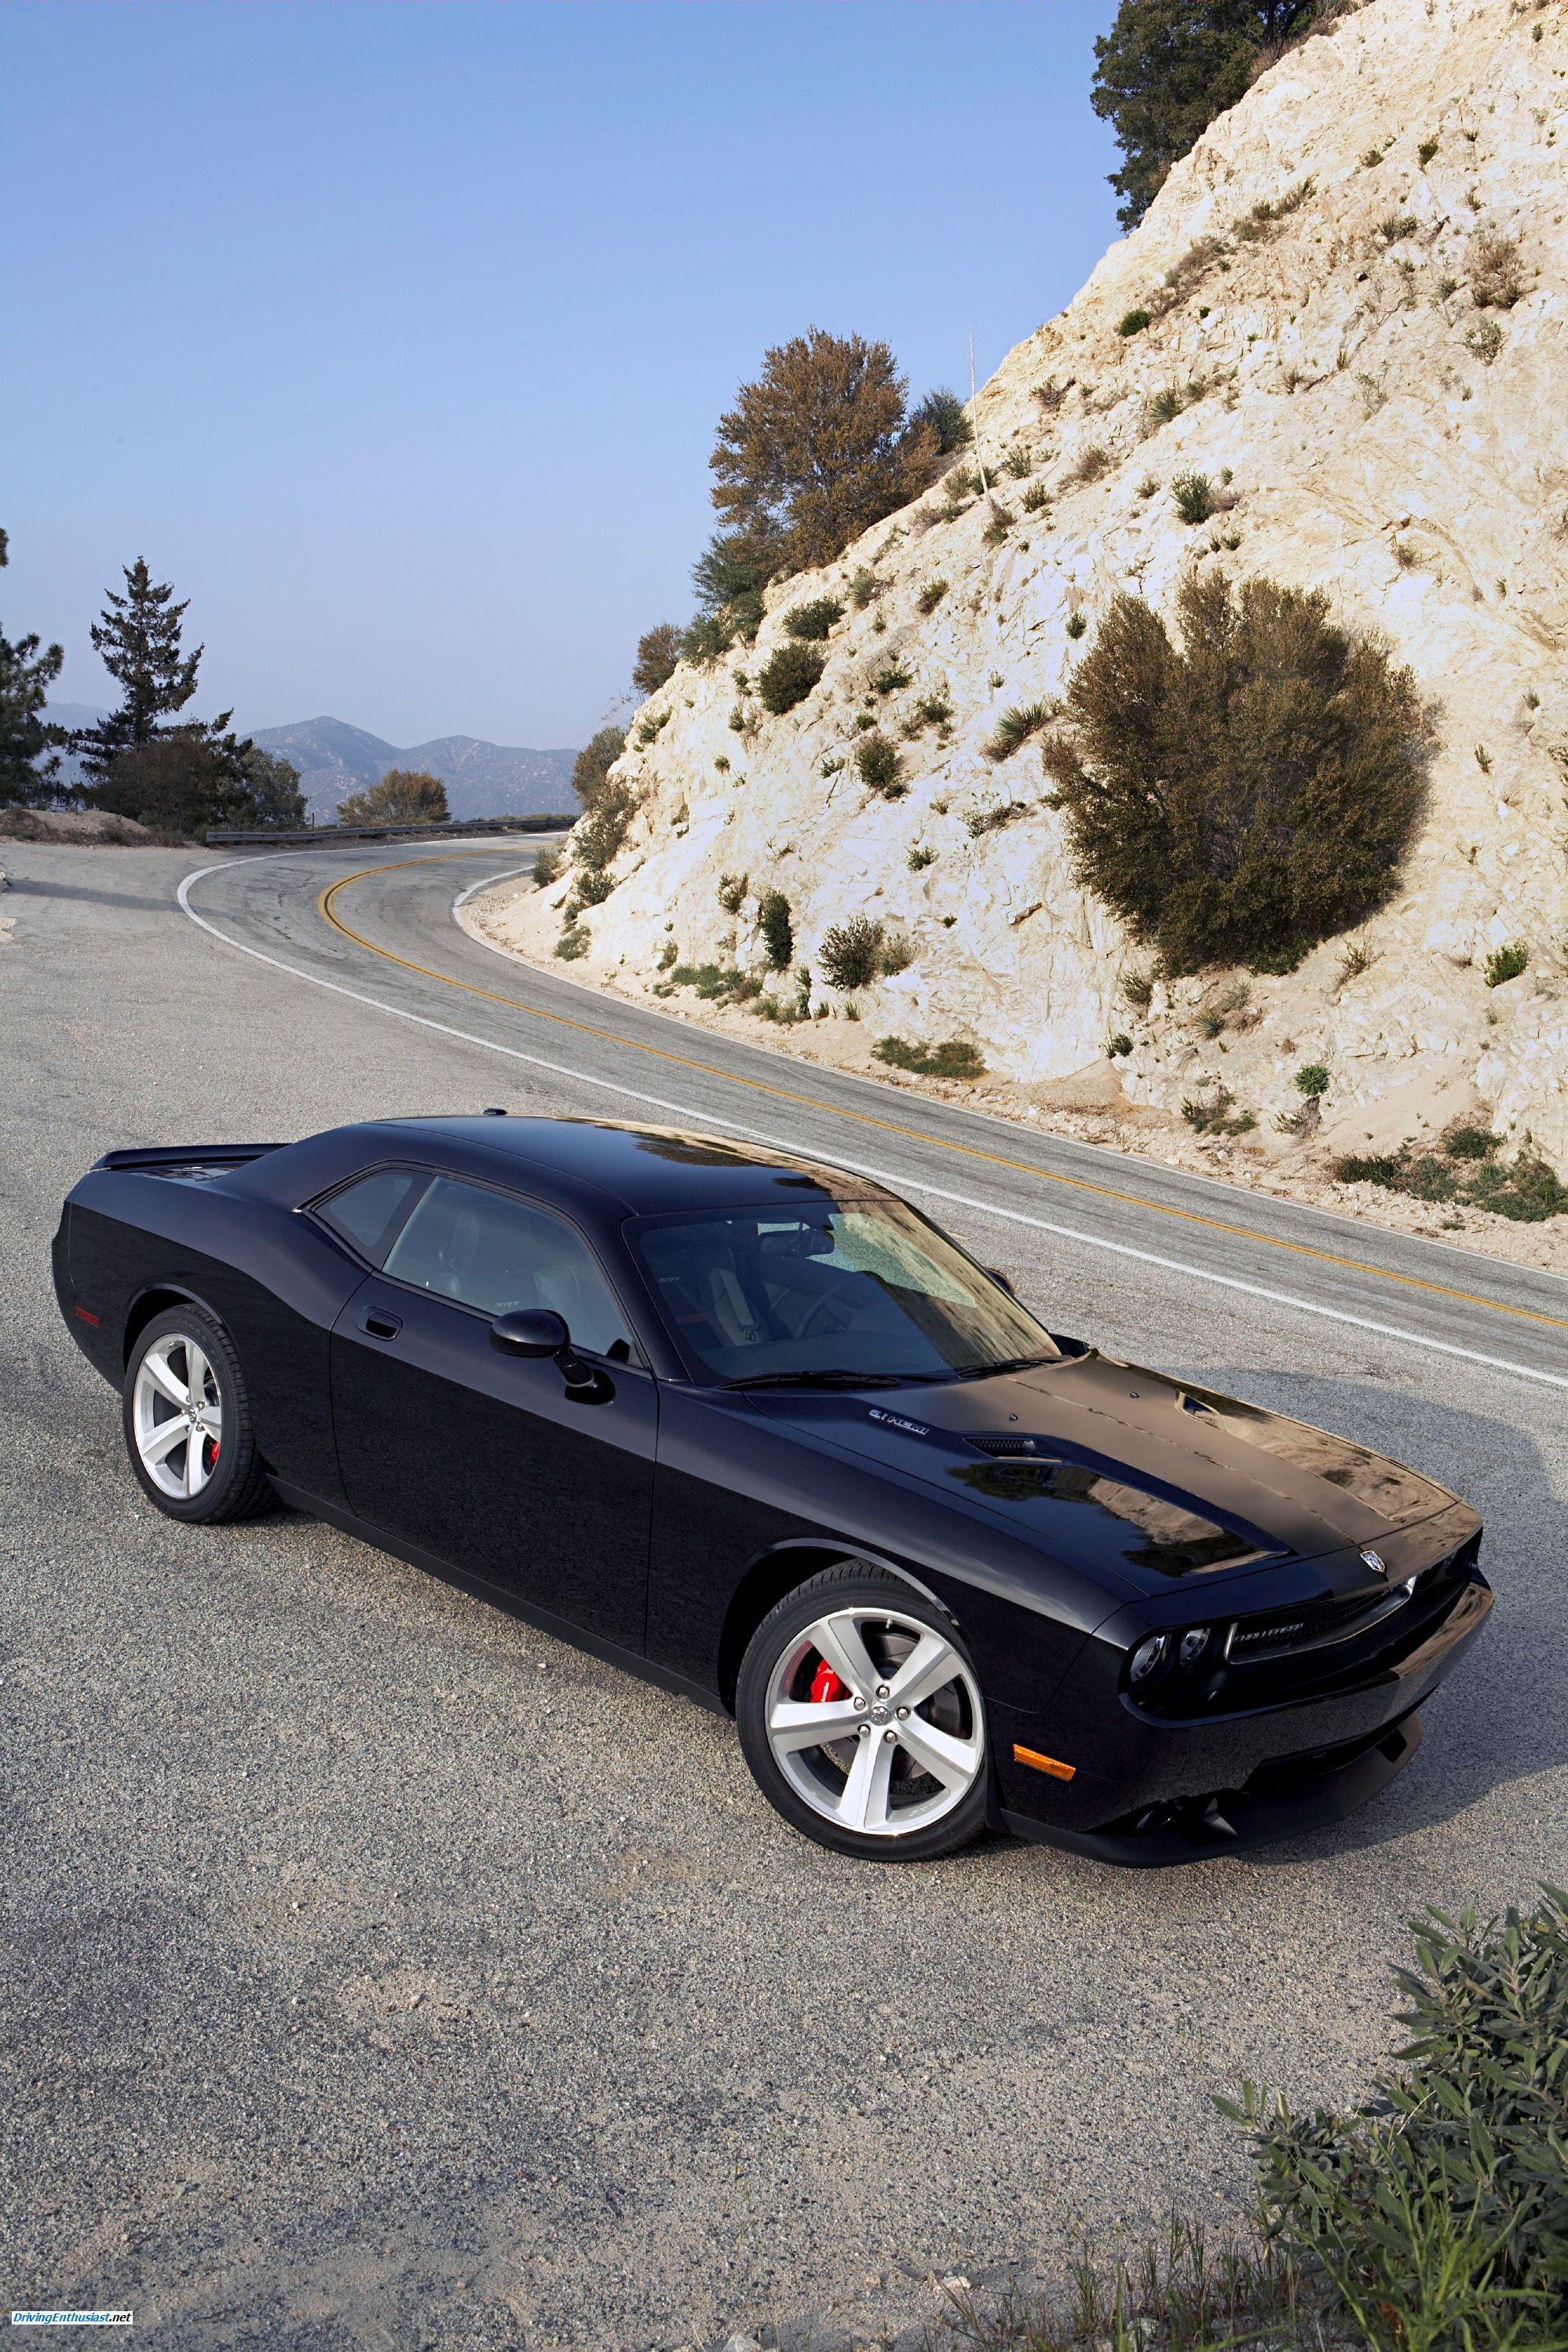 2008 Dodge Challenger Srt8 See More At Challengerenthusiast Com